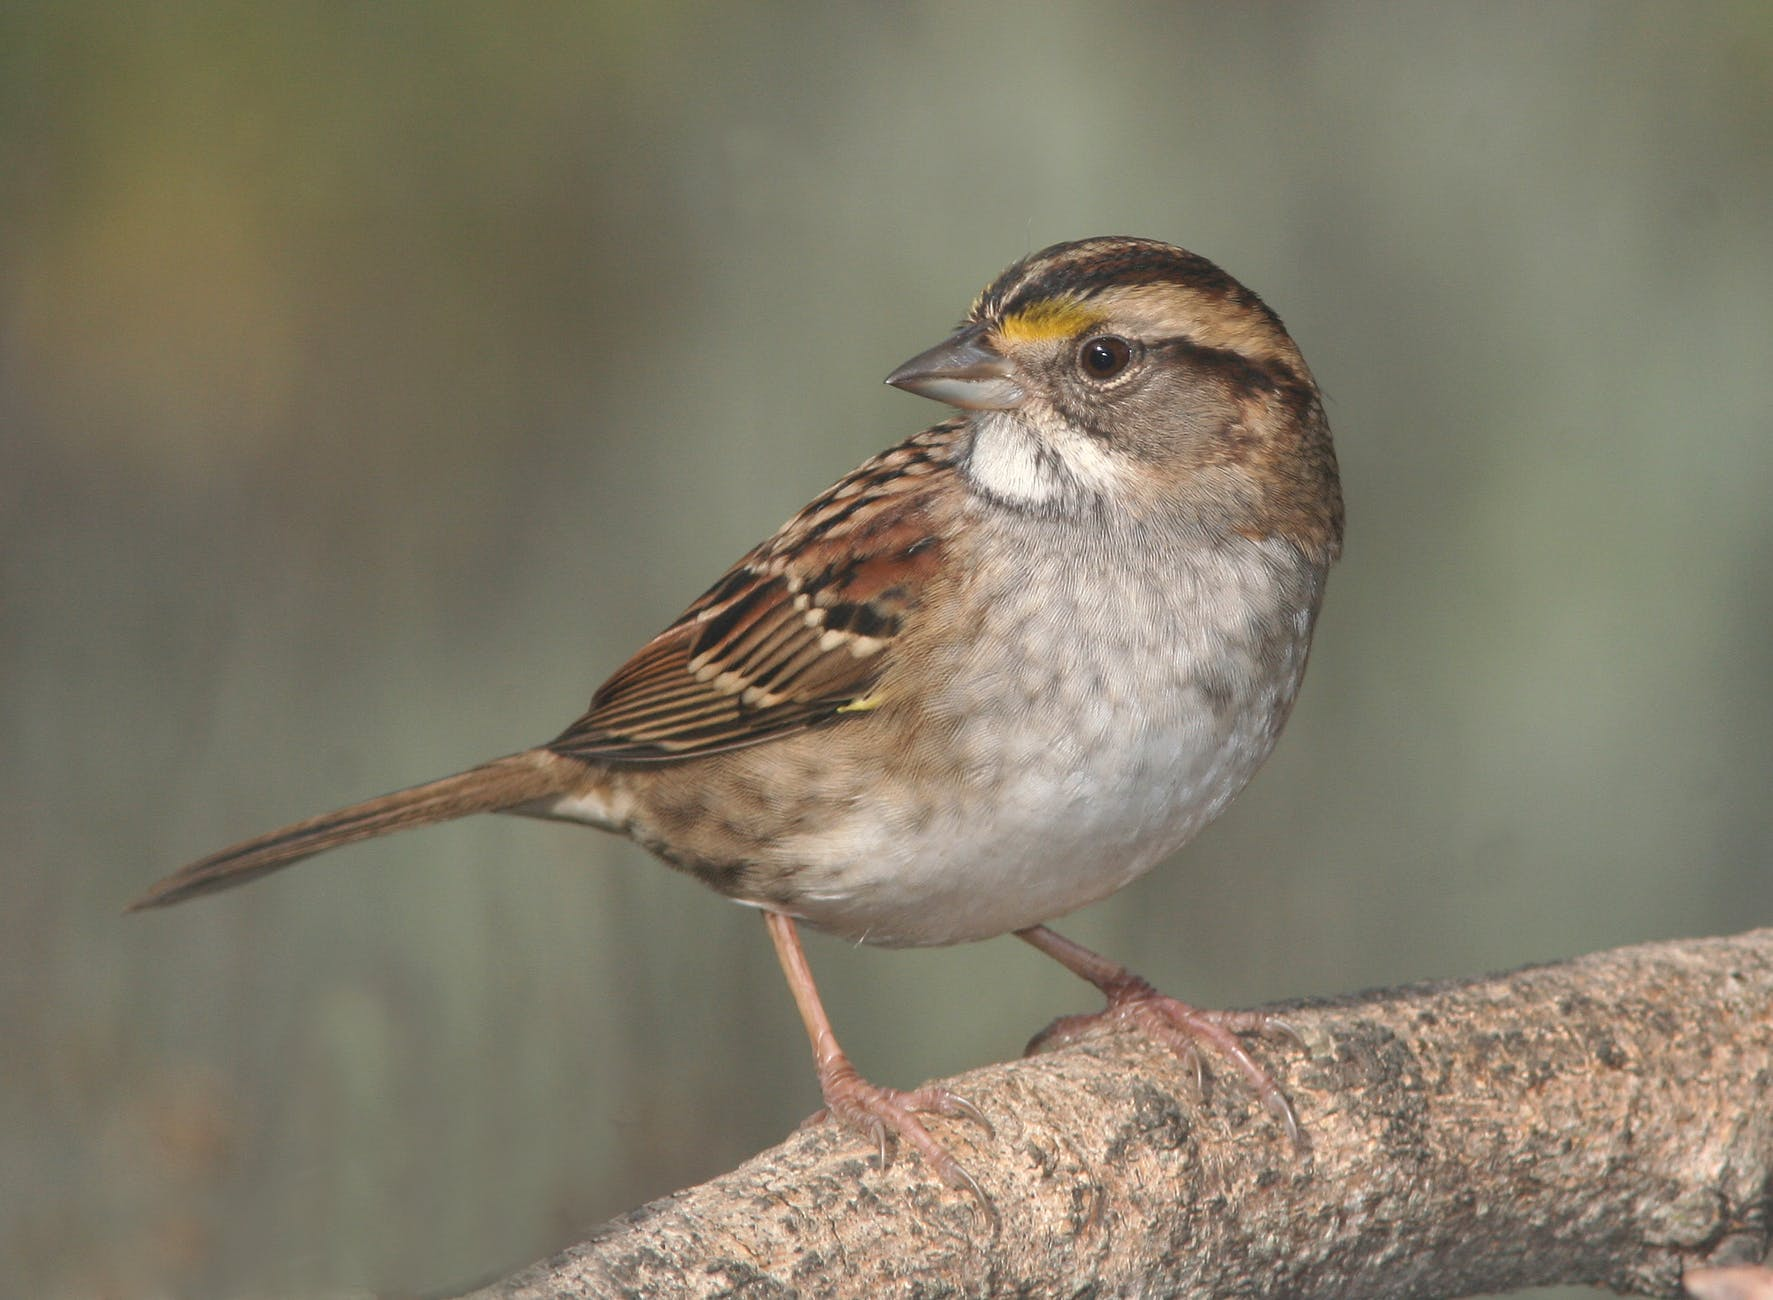 brown small beak bird